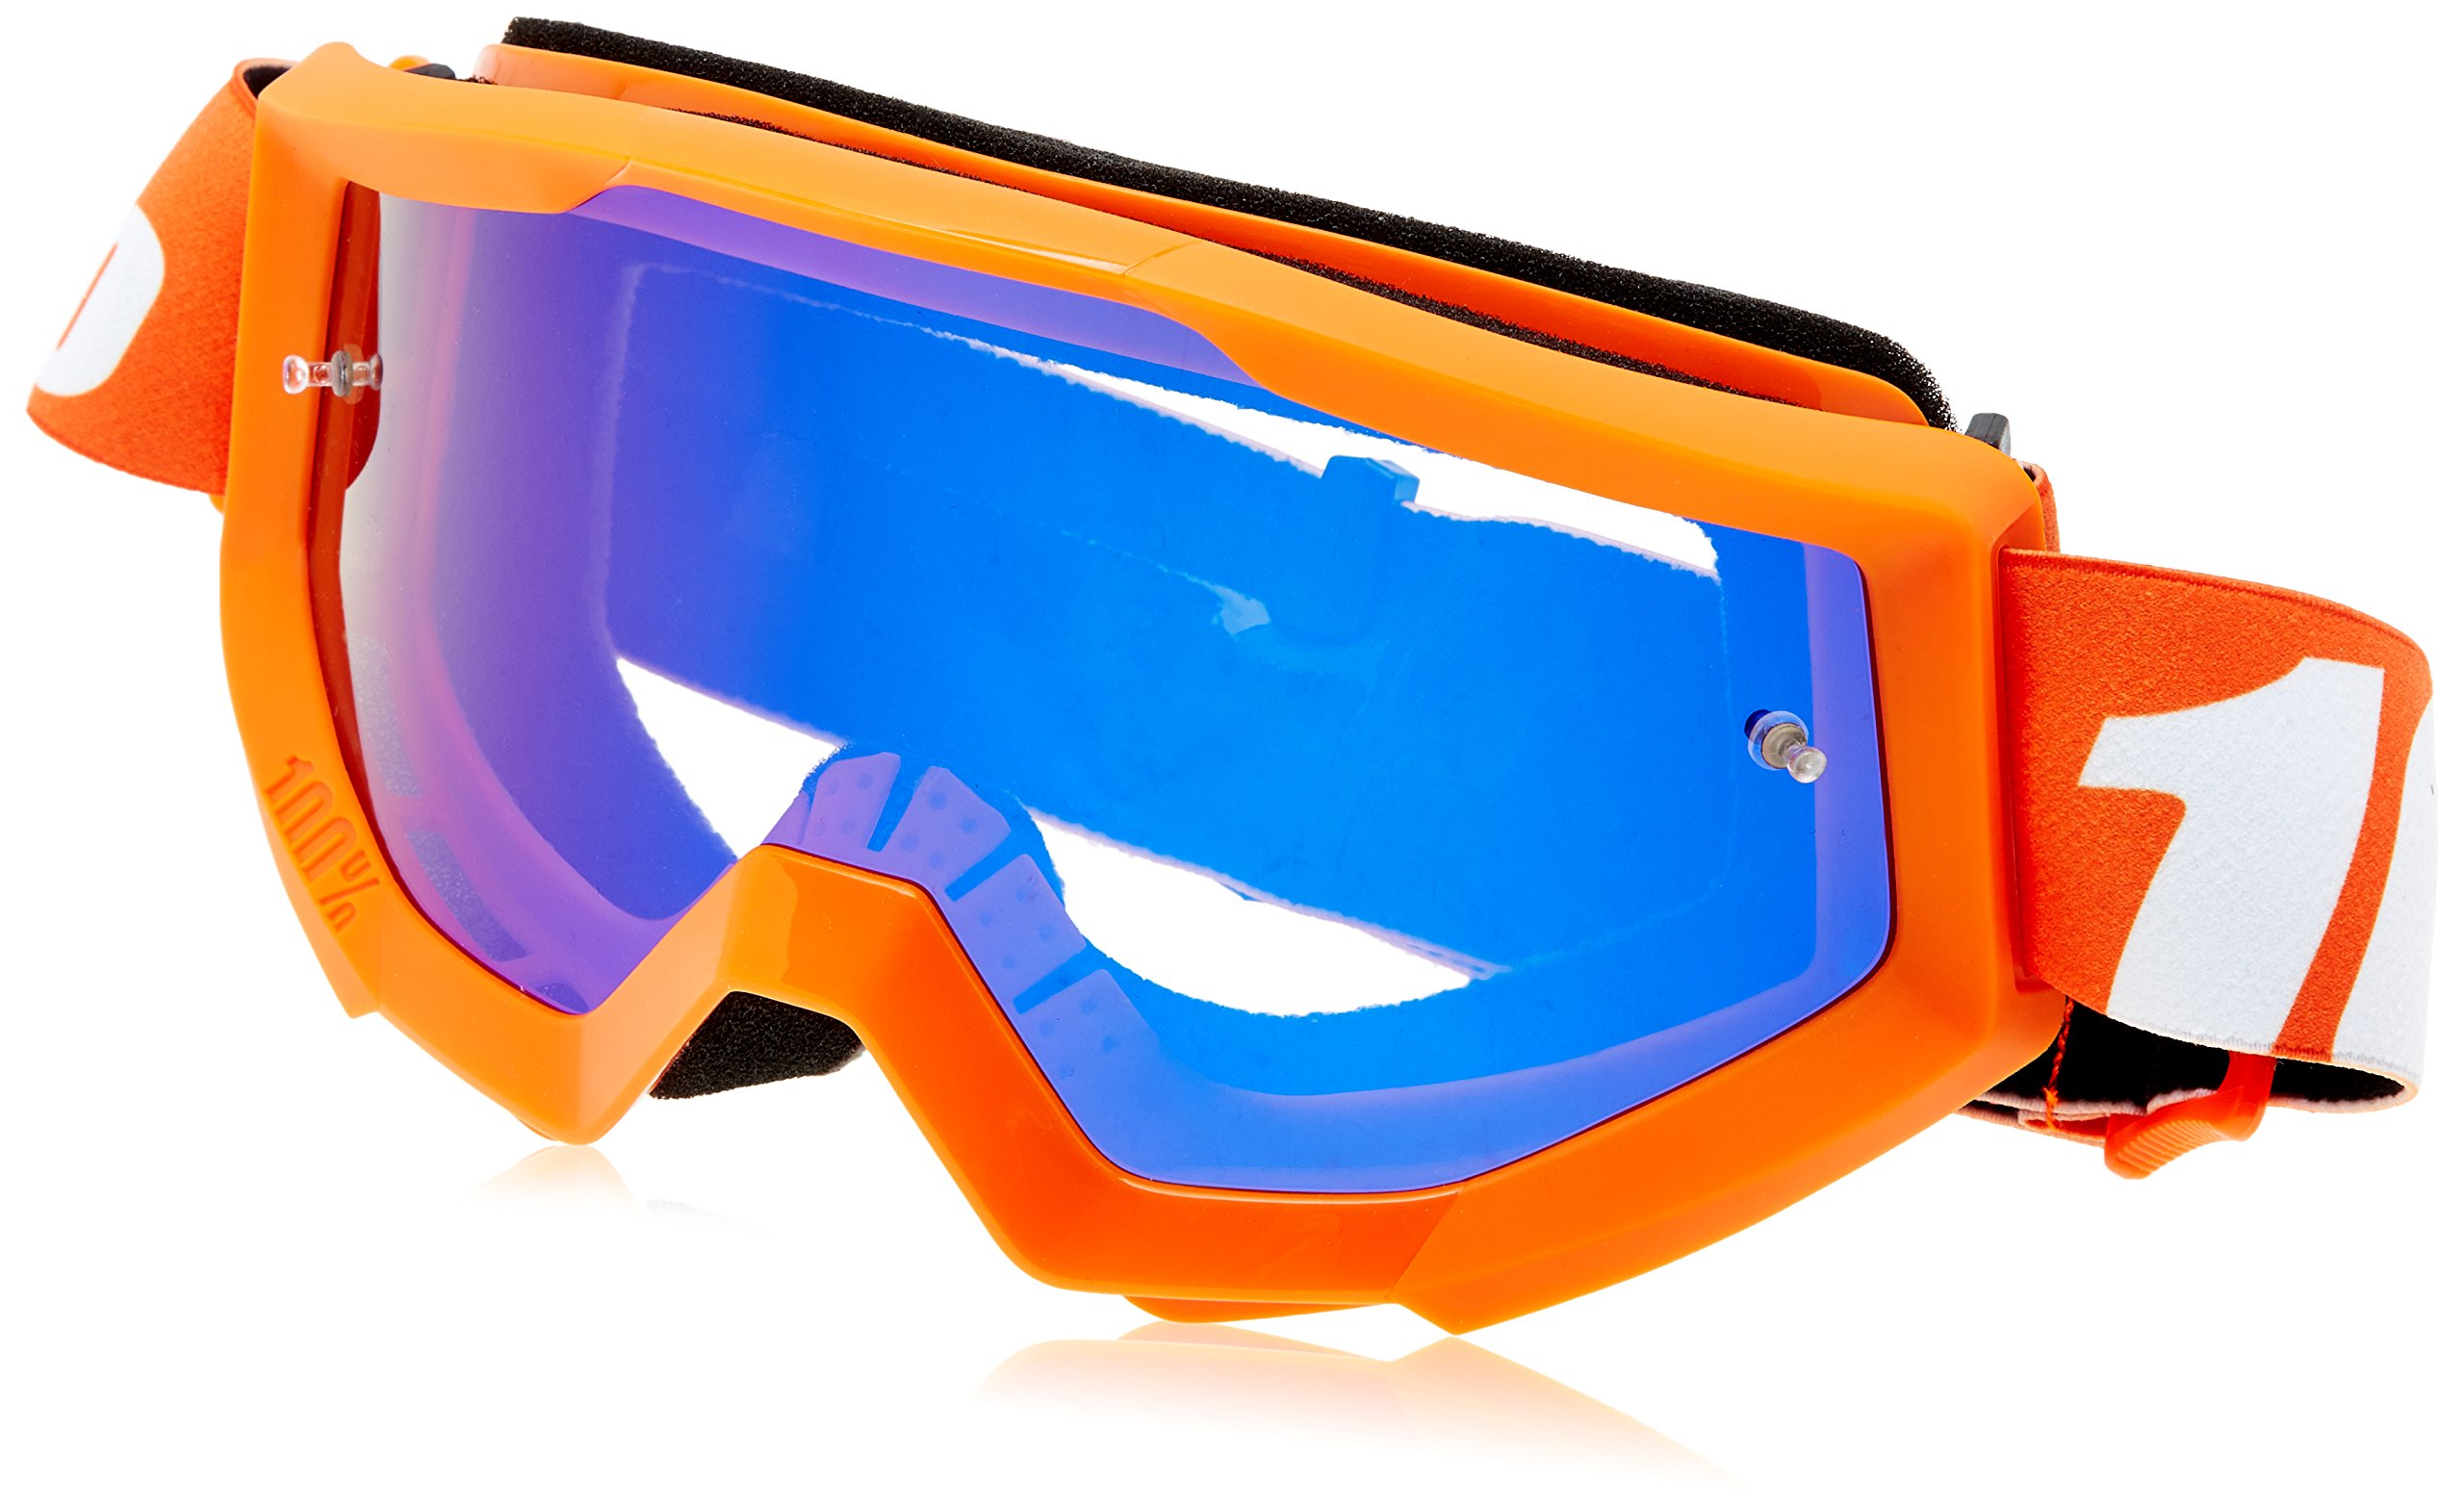 100% STRATA Goggles Orange - Clear Lens, One Size